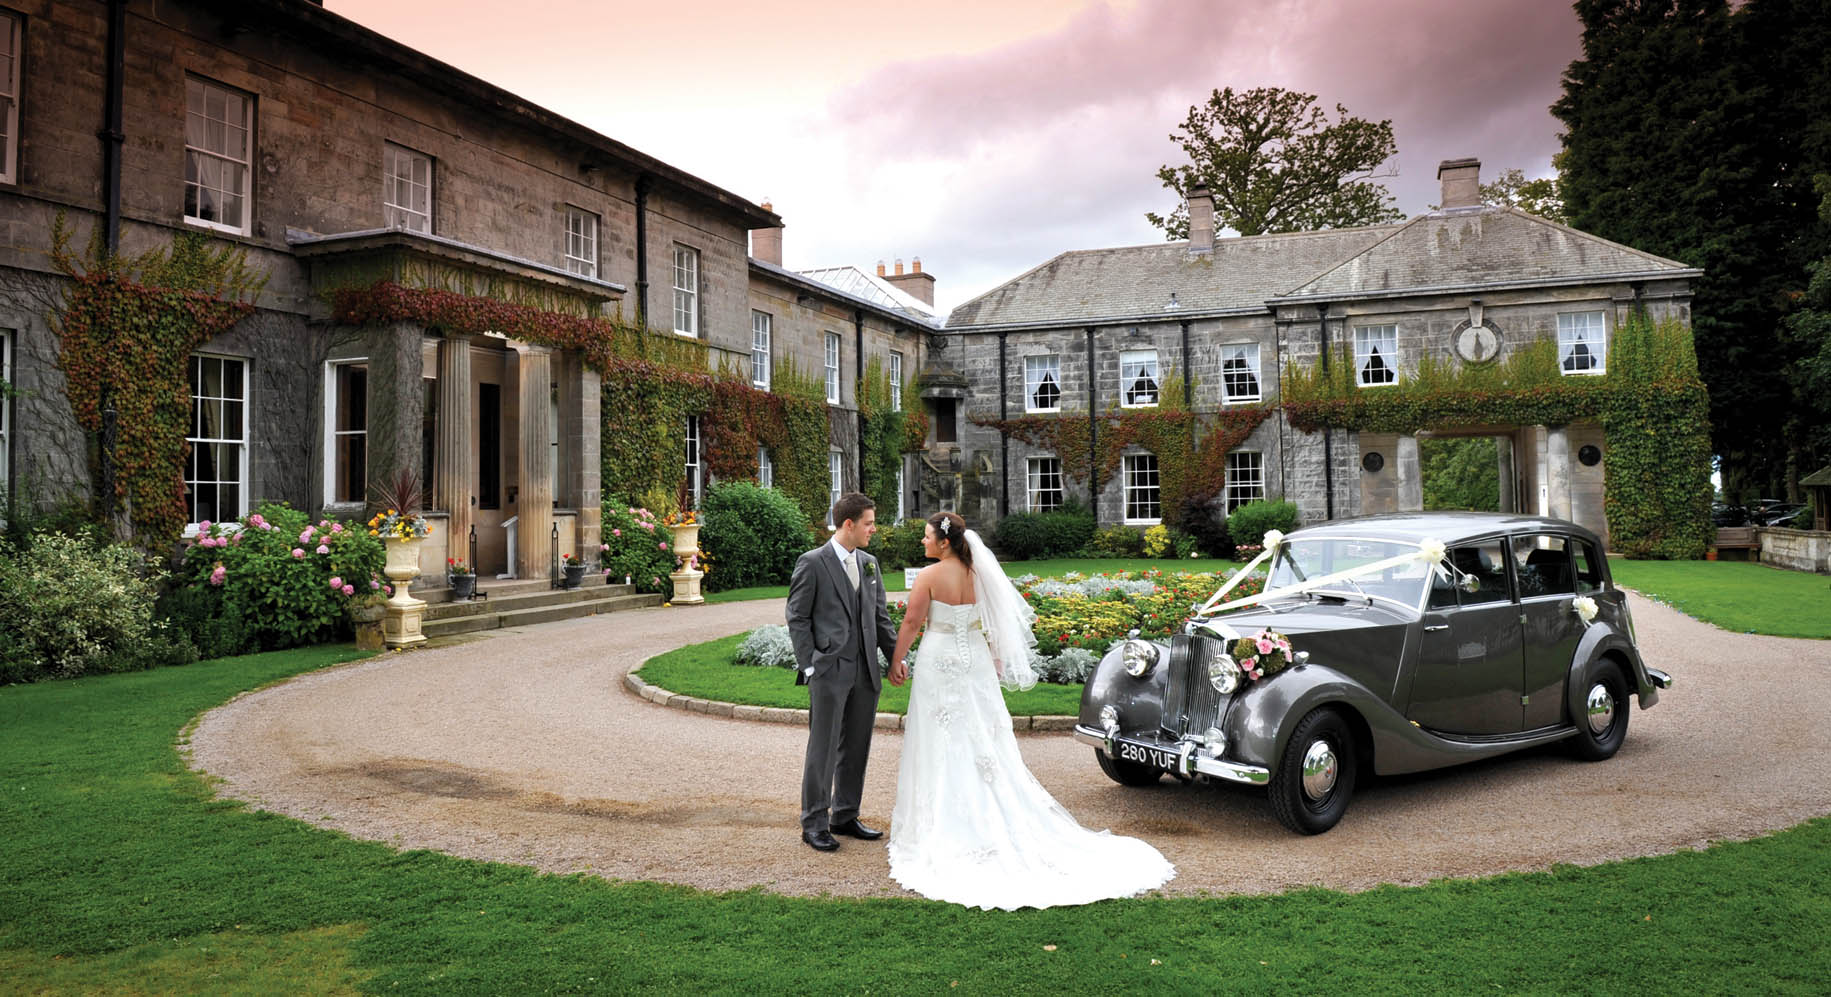 Wedding Reception Venues North East : Doxford hall wedding venues north east